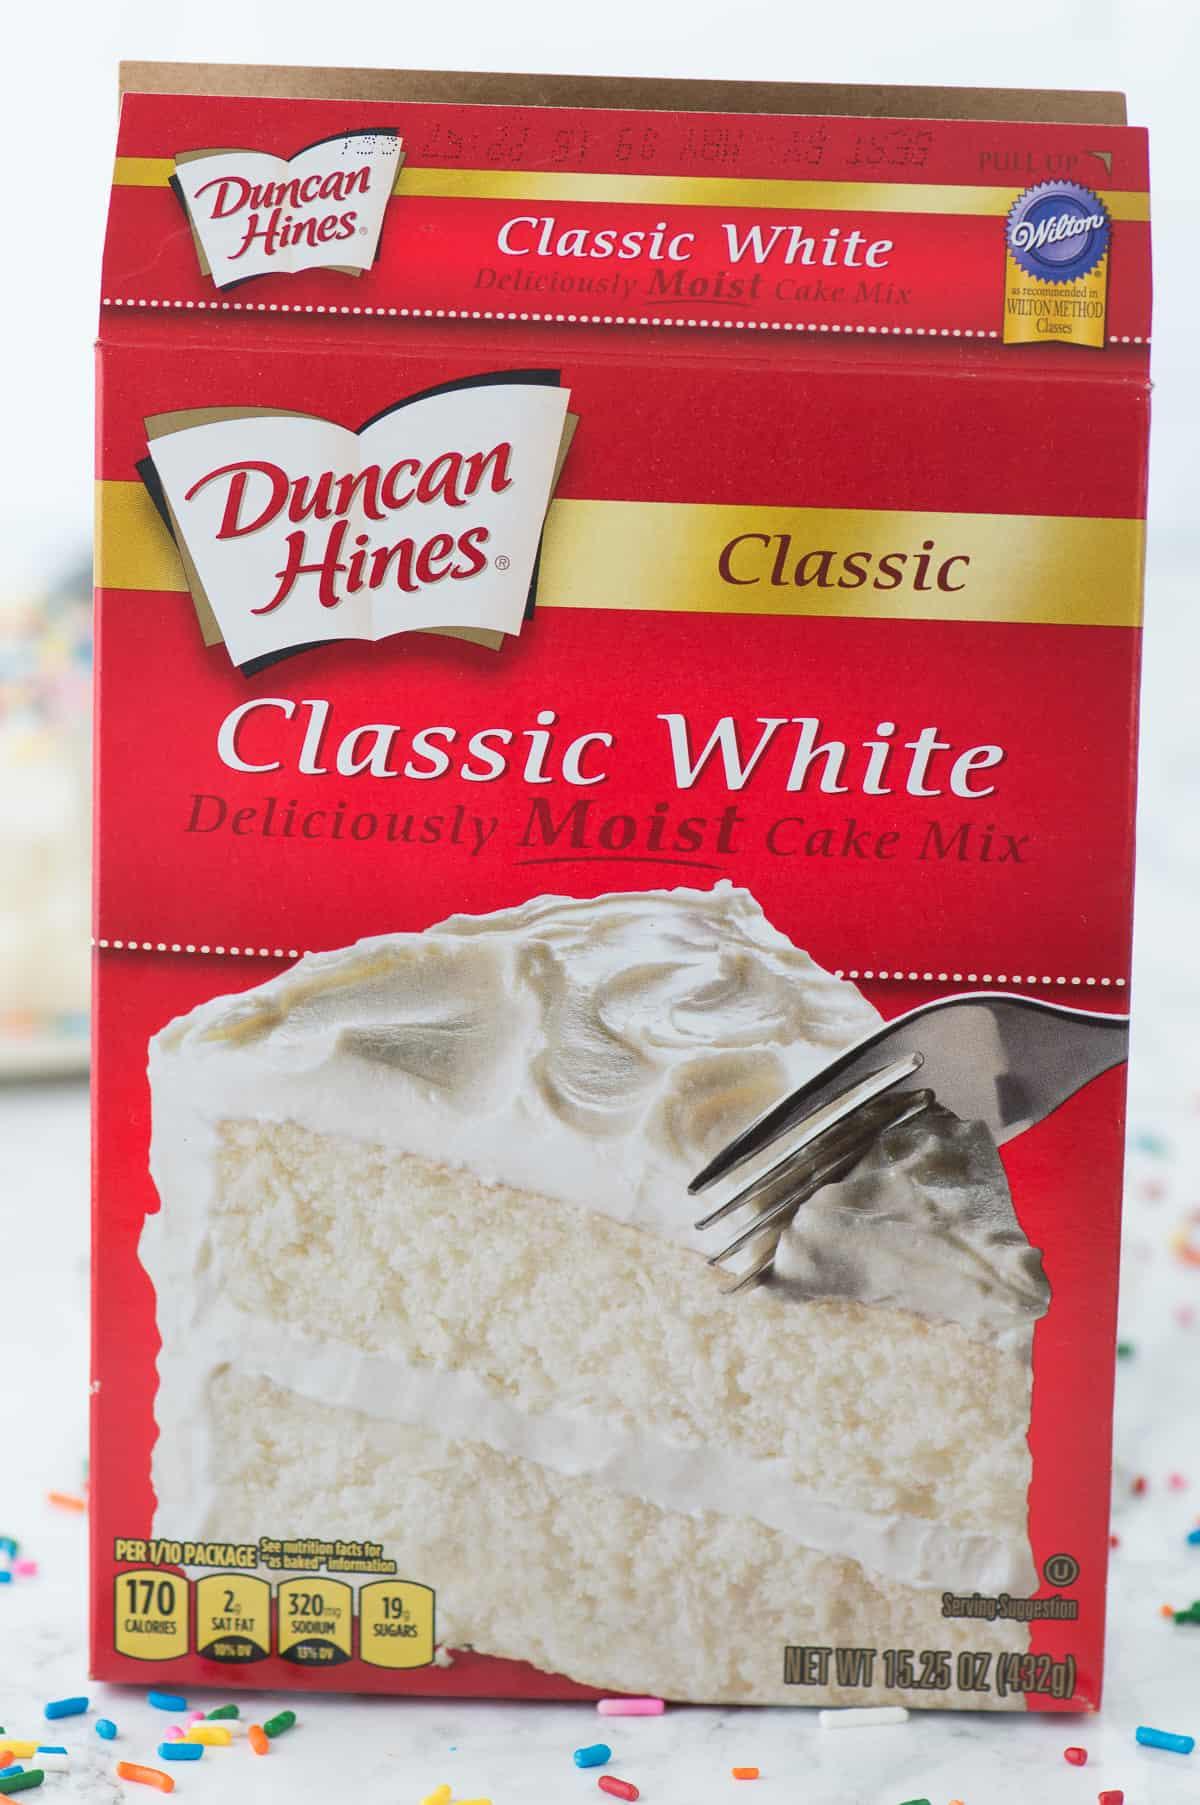 box of duncan hines classic white cake mix